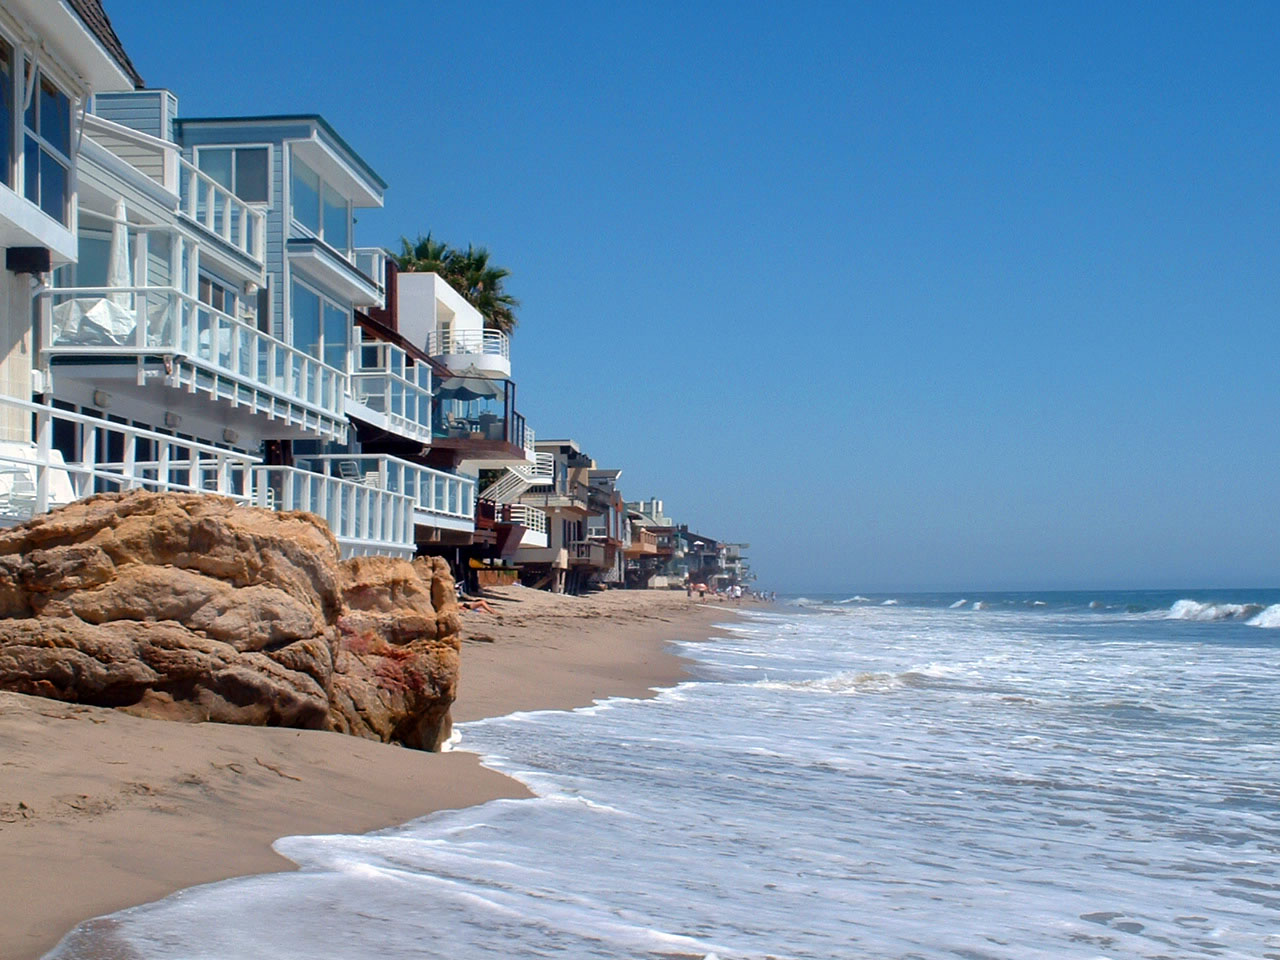 Los angeles aufsatzsammlung sparkling science for Malibu california beach houses